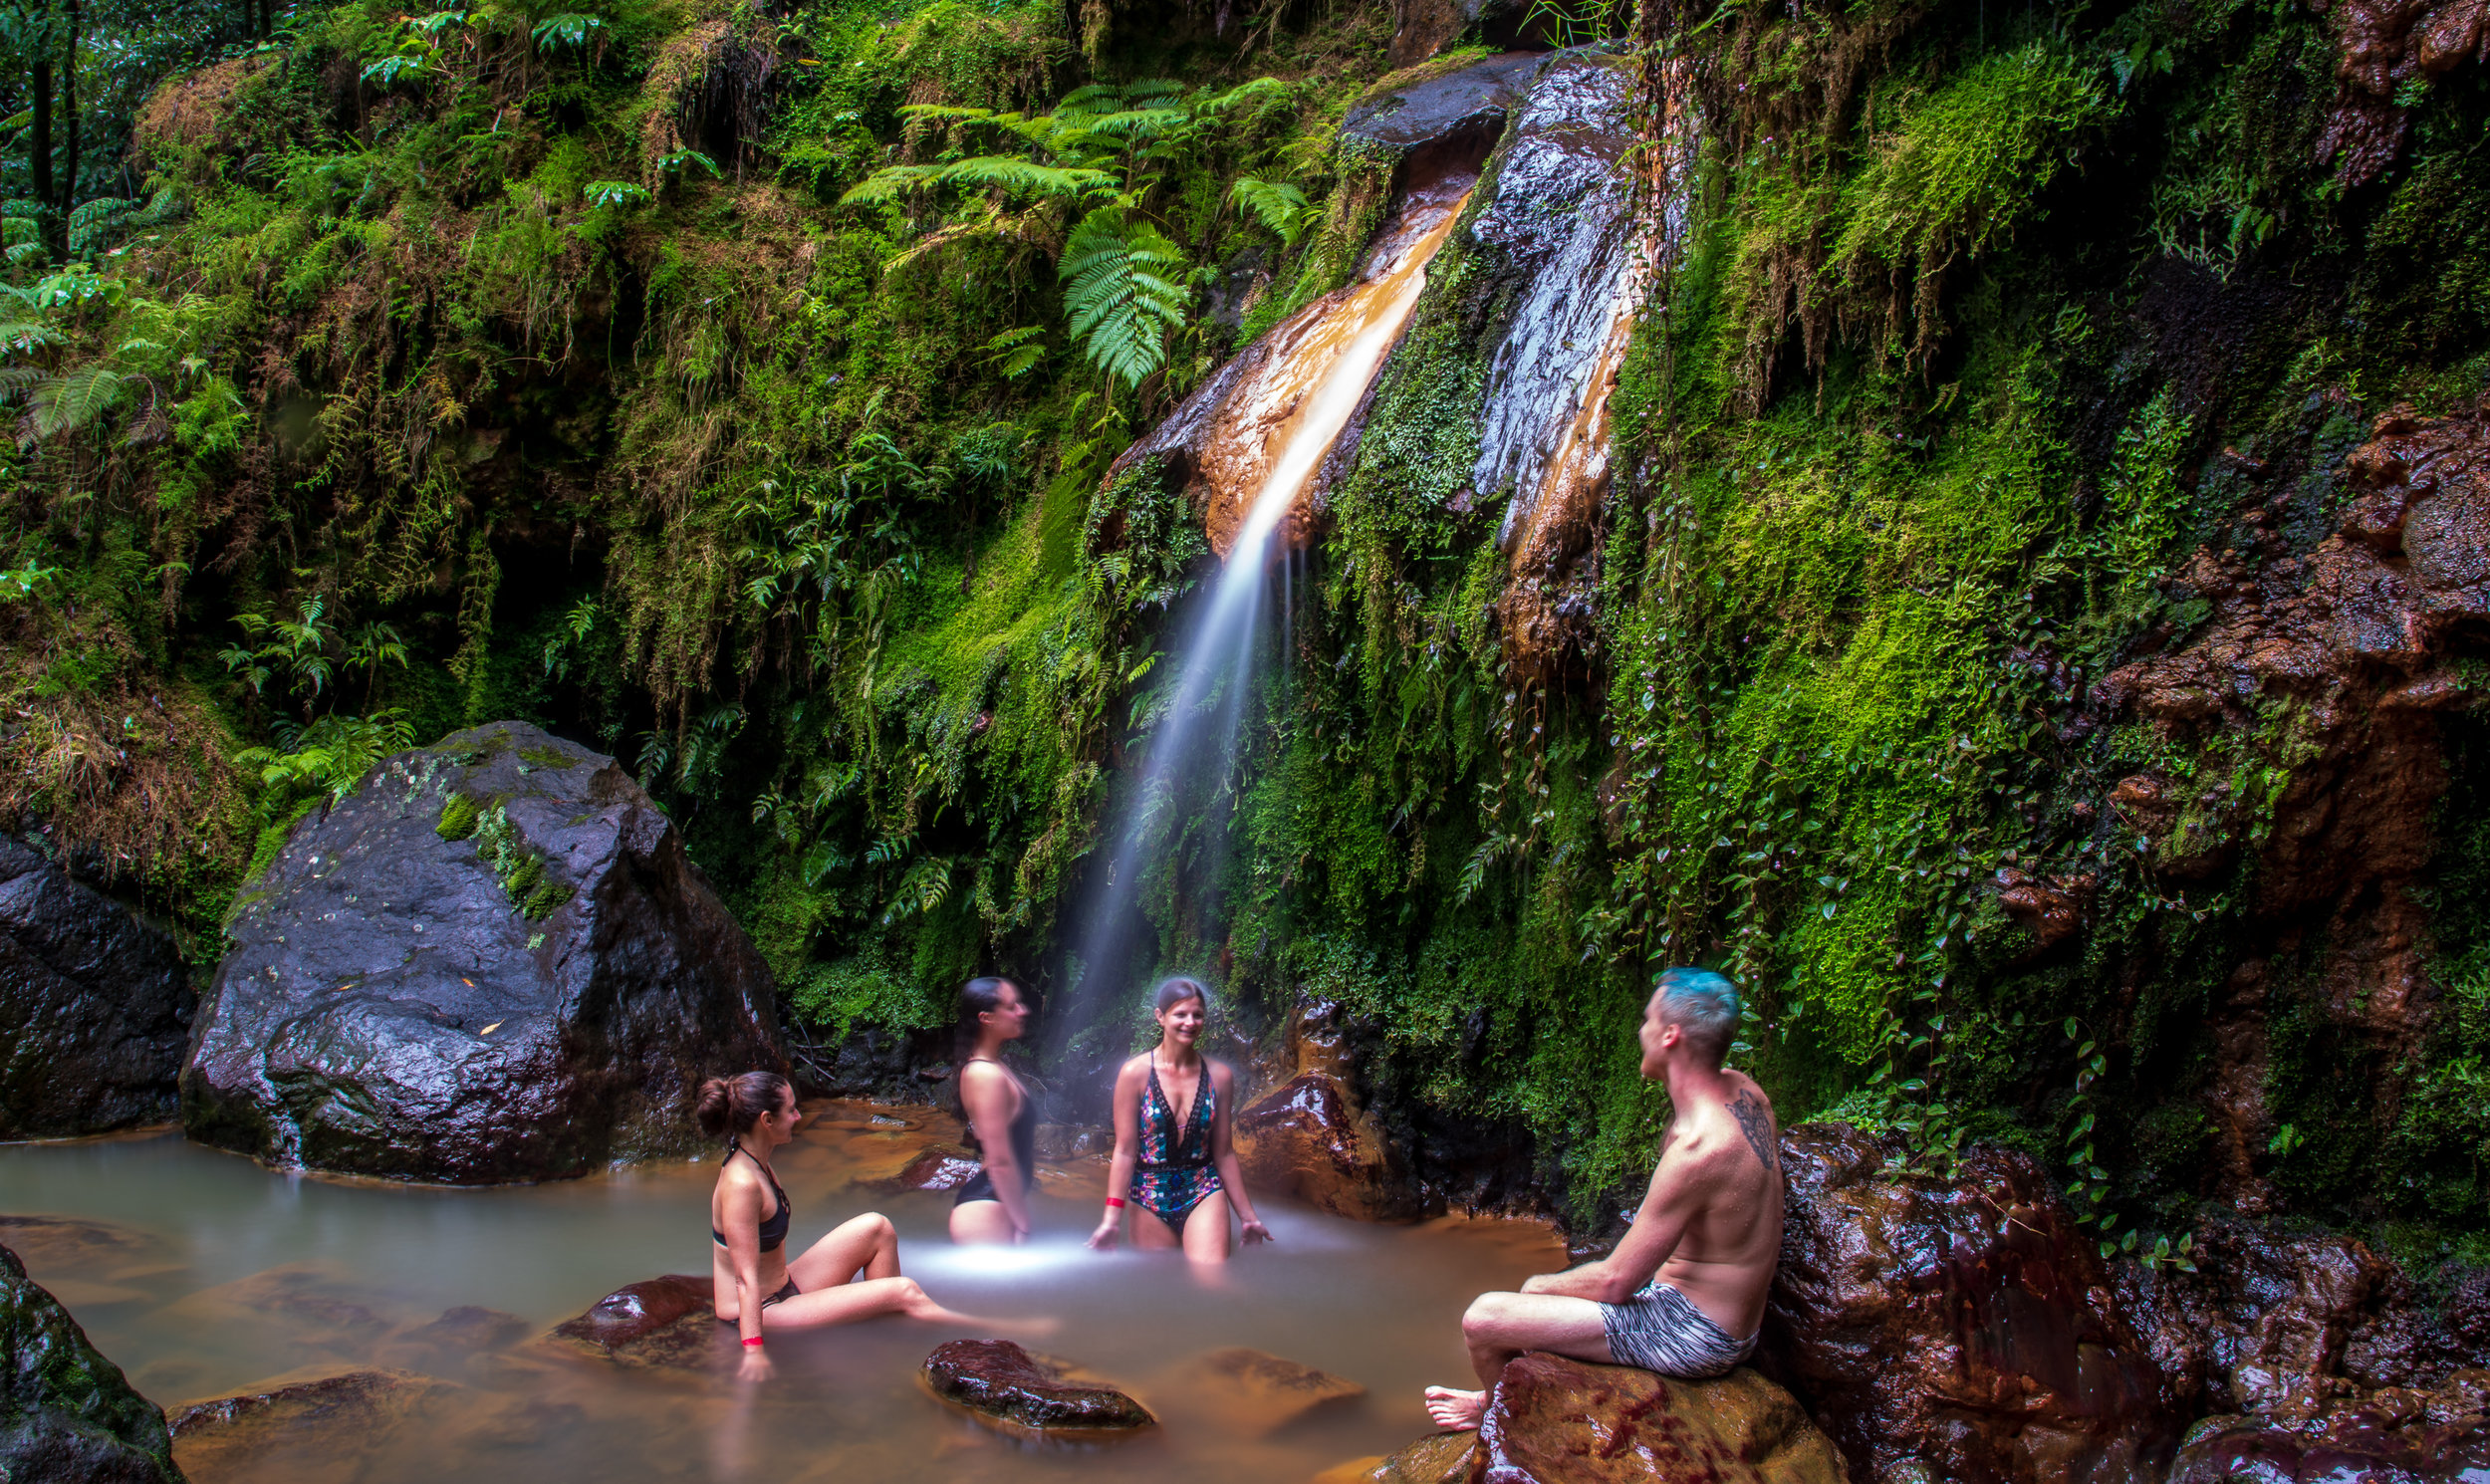 Thermal basin, Caldeira Velha, Sao Miguel, Azores, Portugal Photo by Josh Alves